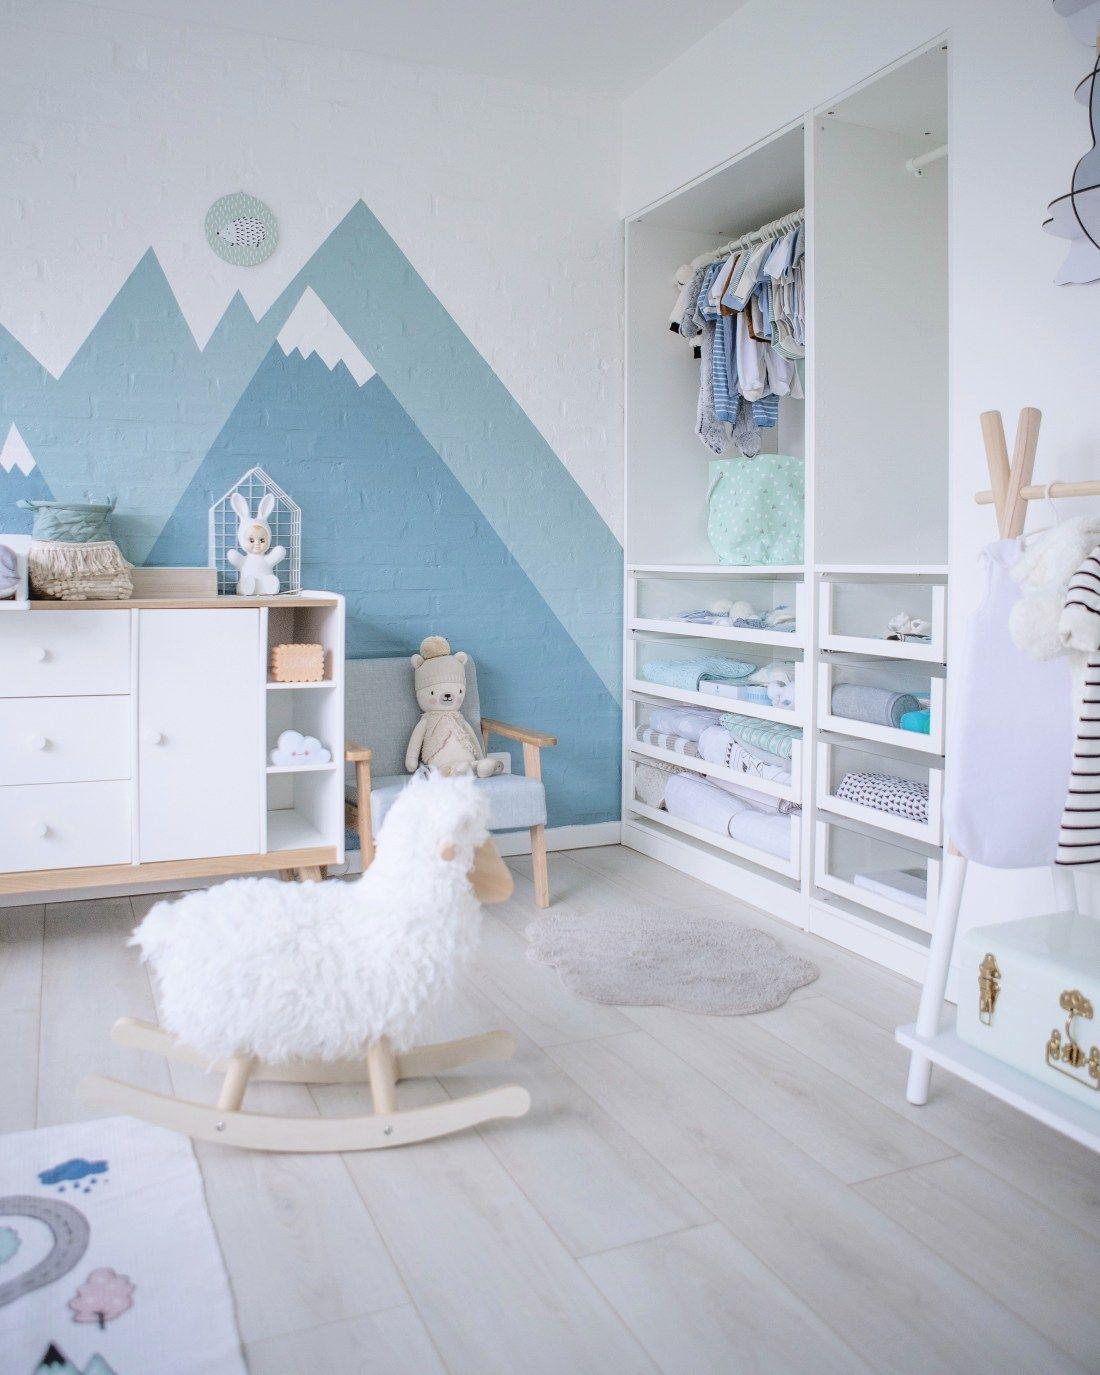 LA CHAMBRE DE BABY OWEN ! - Babychoufamily  Décoration chambre